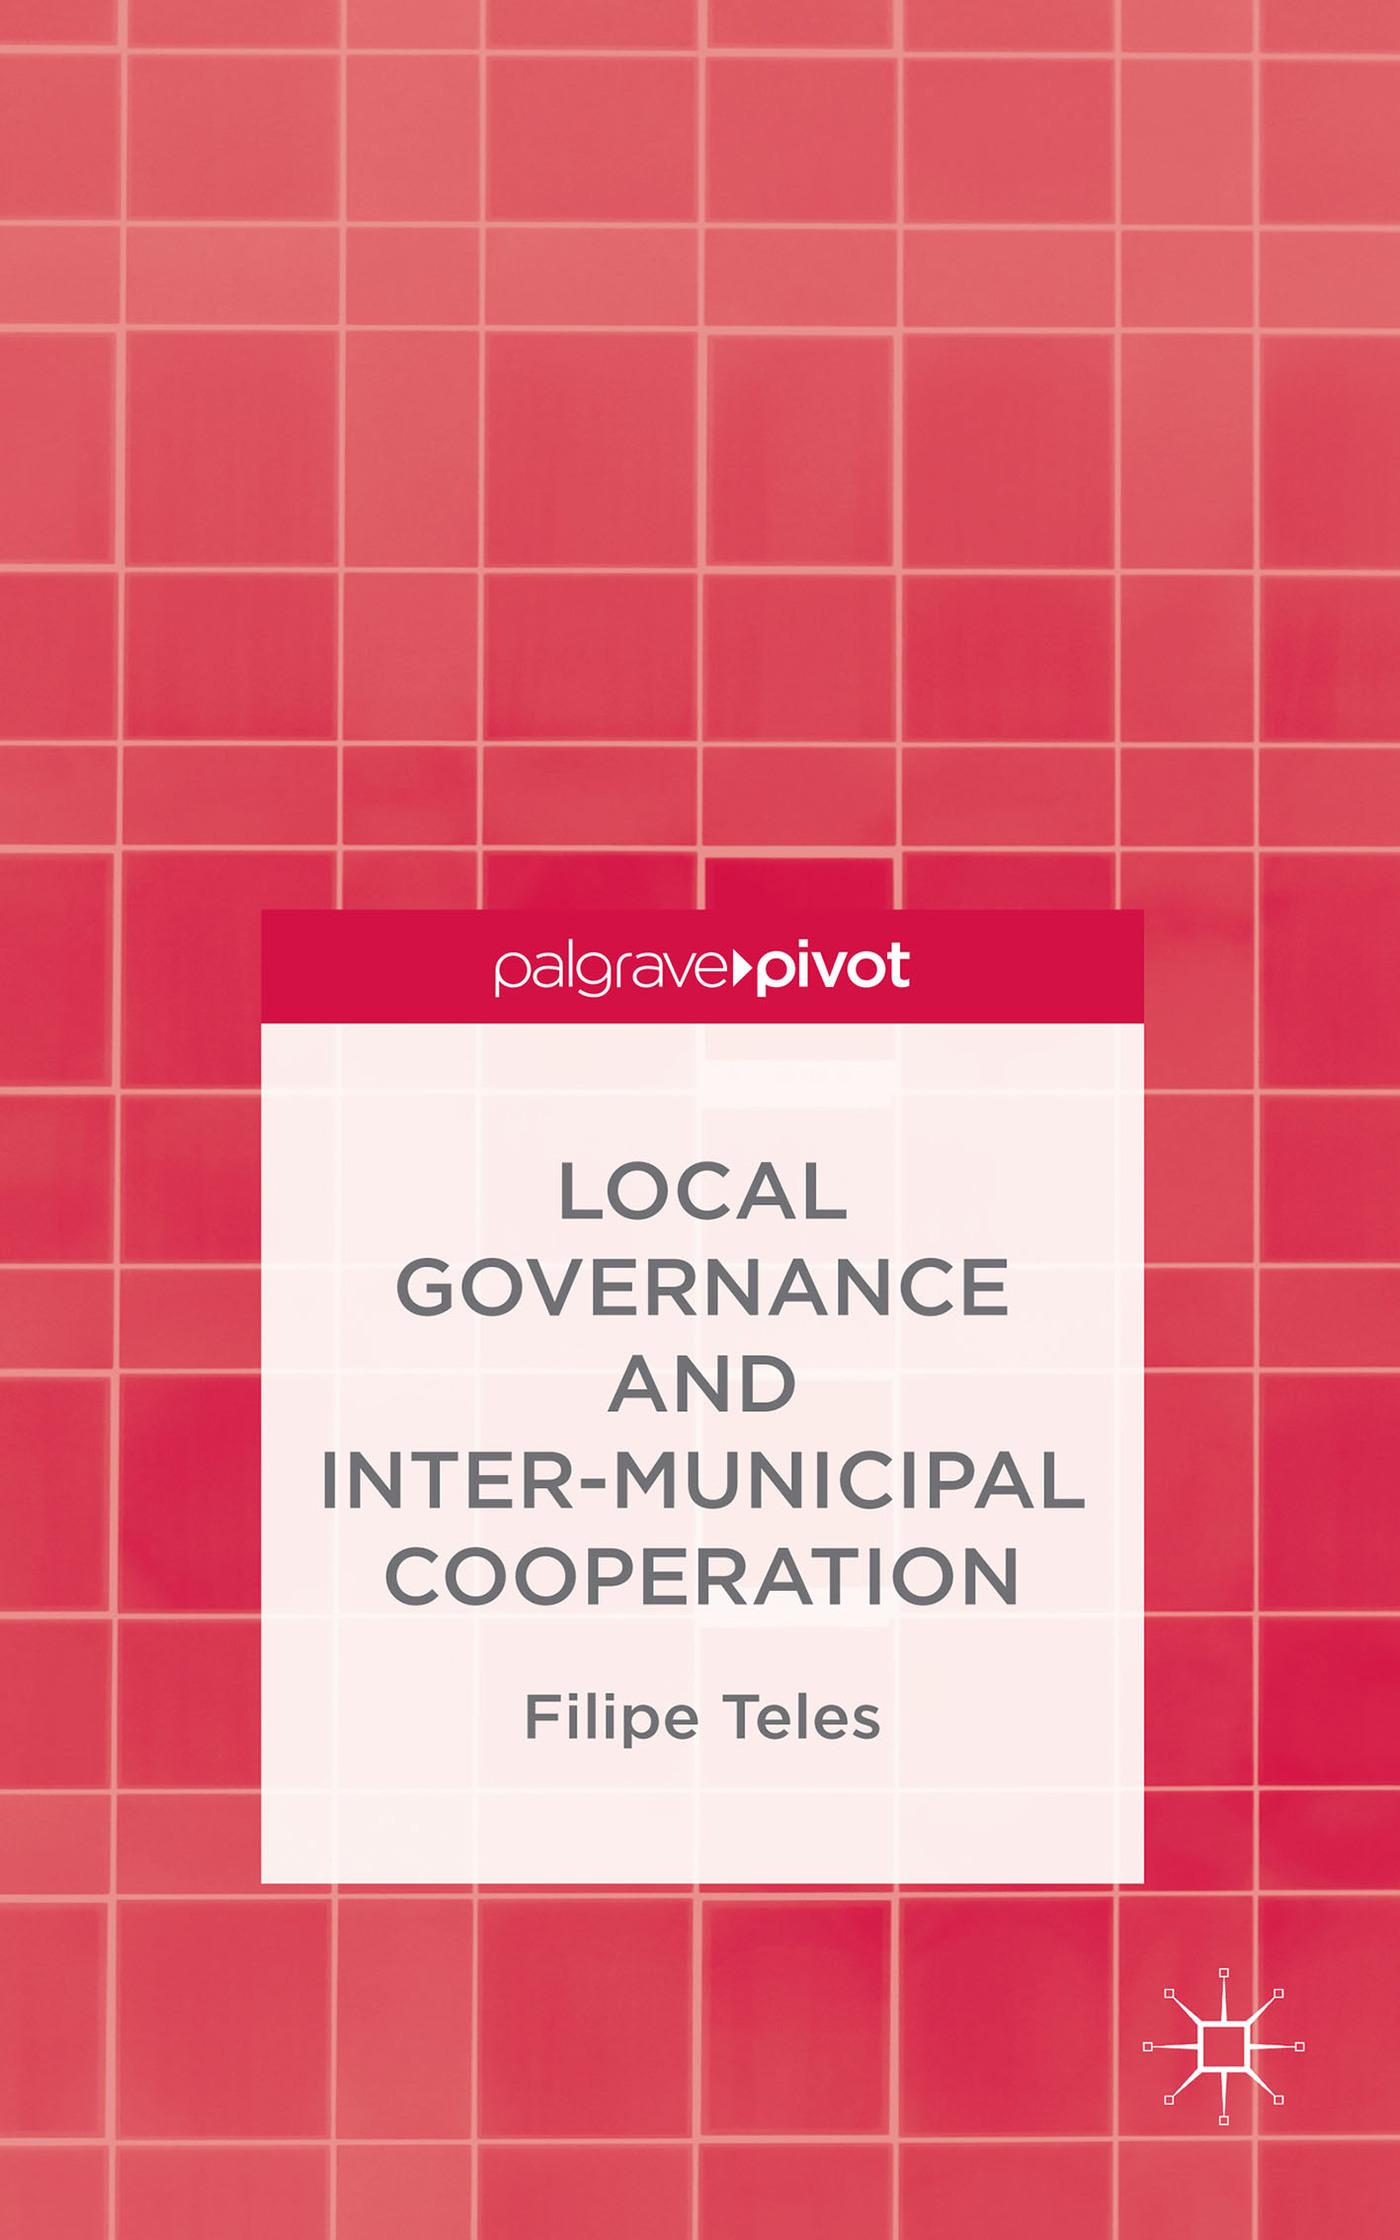 Local Governance and Inter-municipal Cooperation Filipe Teles